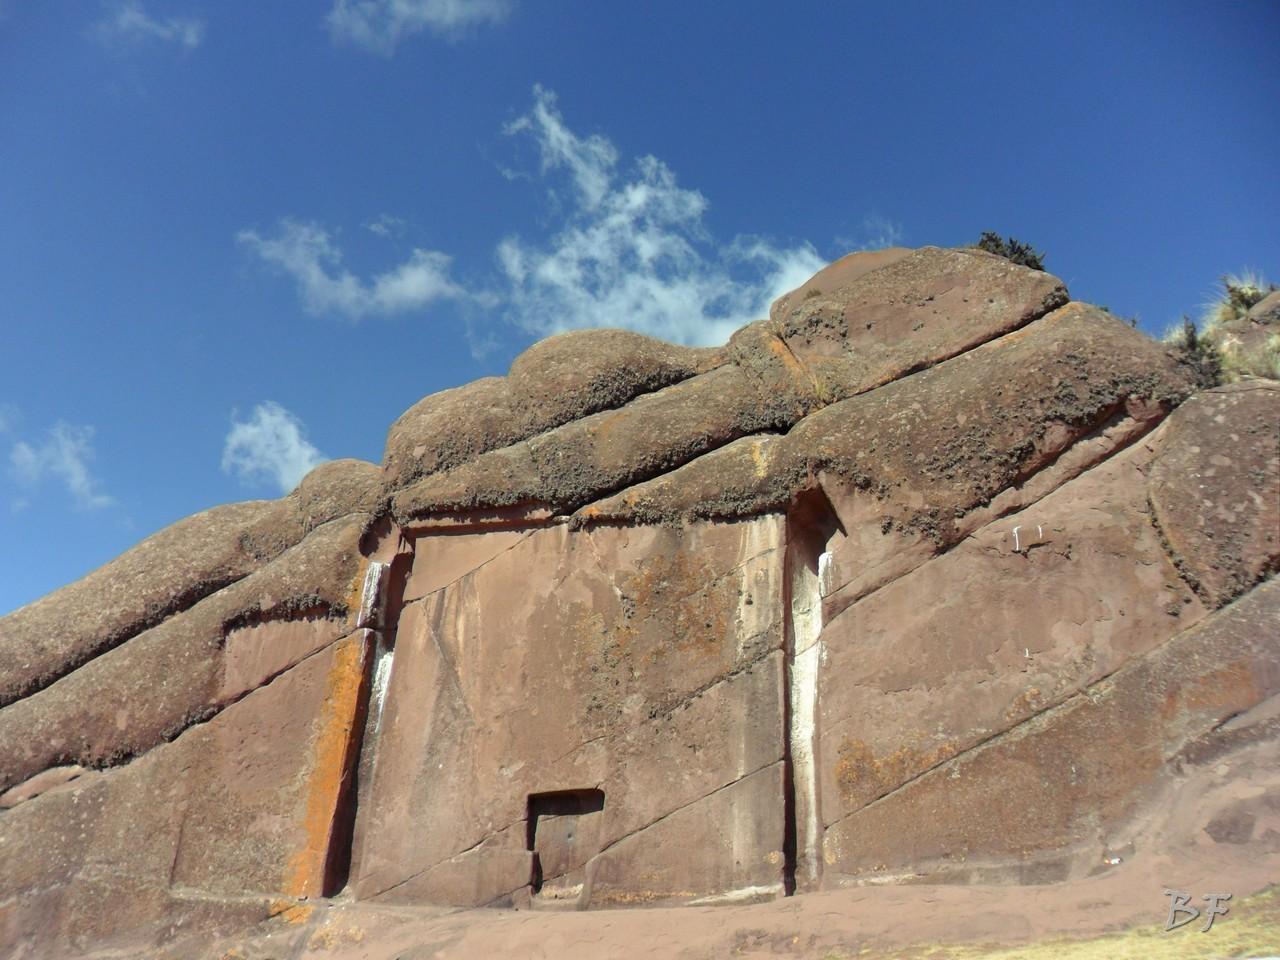 Edificio-Rupestre-Porta-Dimensionale-Megaliti-Aramu-Muru-Puno-Perù-1